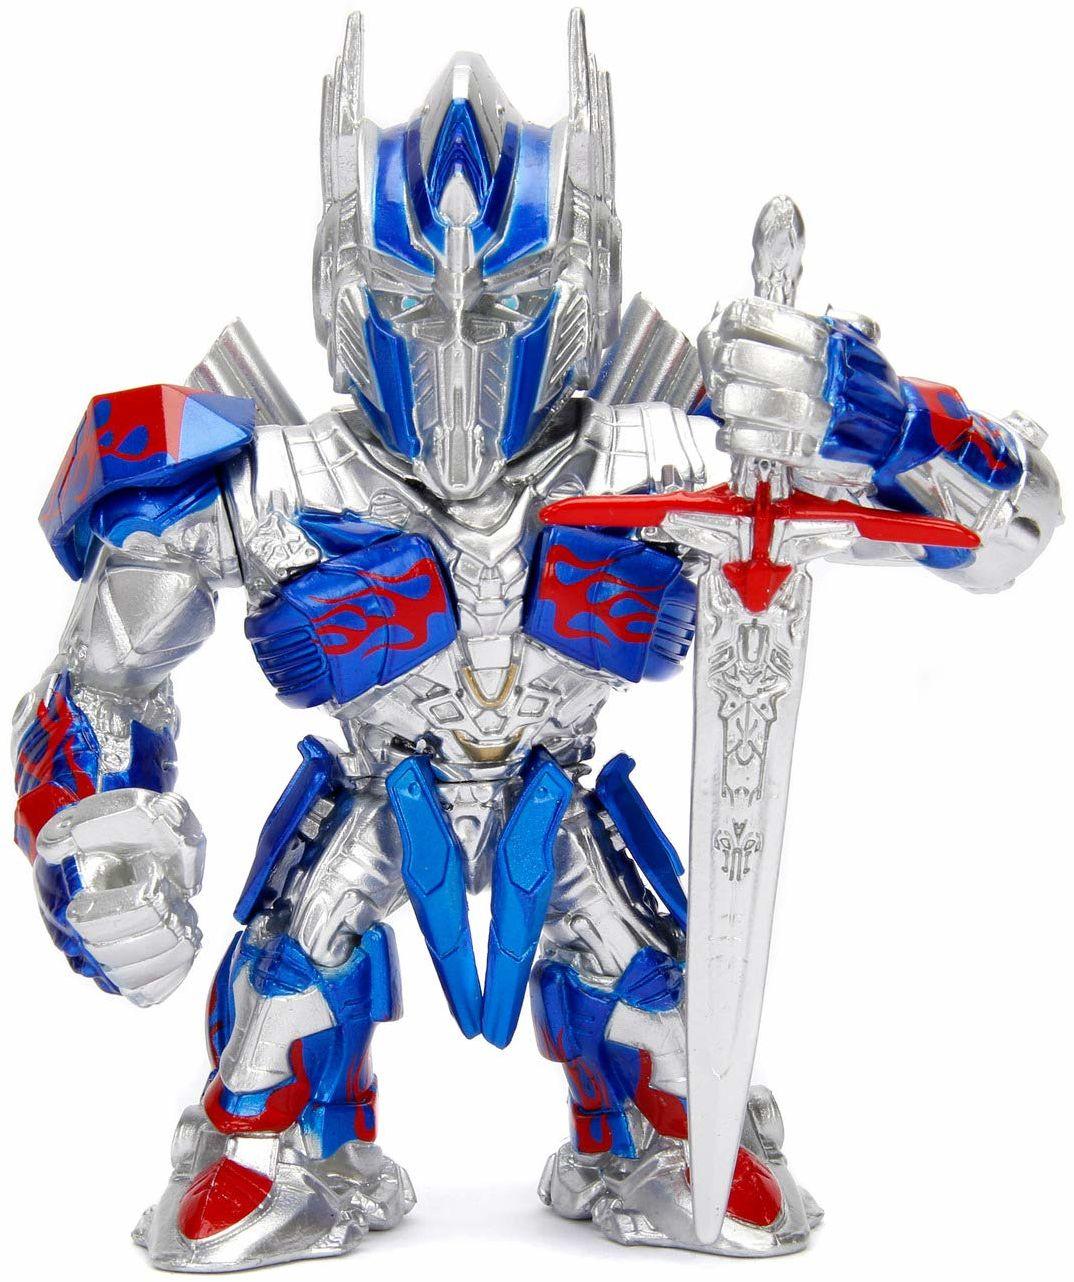 Jada Toys Transformers Optimus Prime Figur, 10 cm, Die-Cast, figurka kolekcjonerska, srebrny/niebieski, 253111002